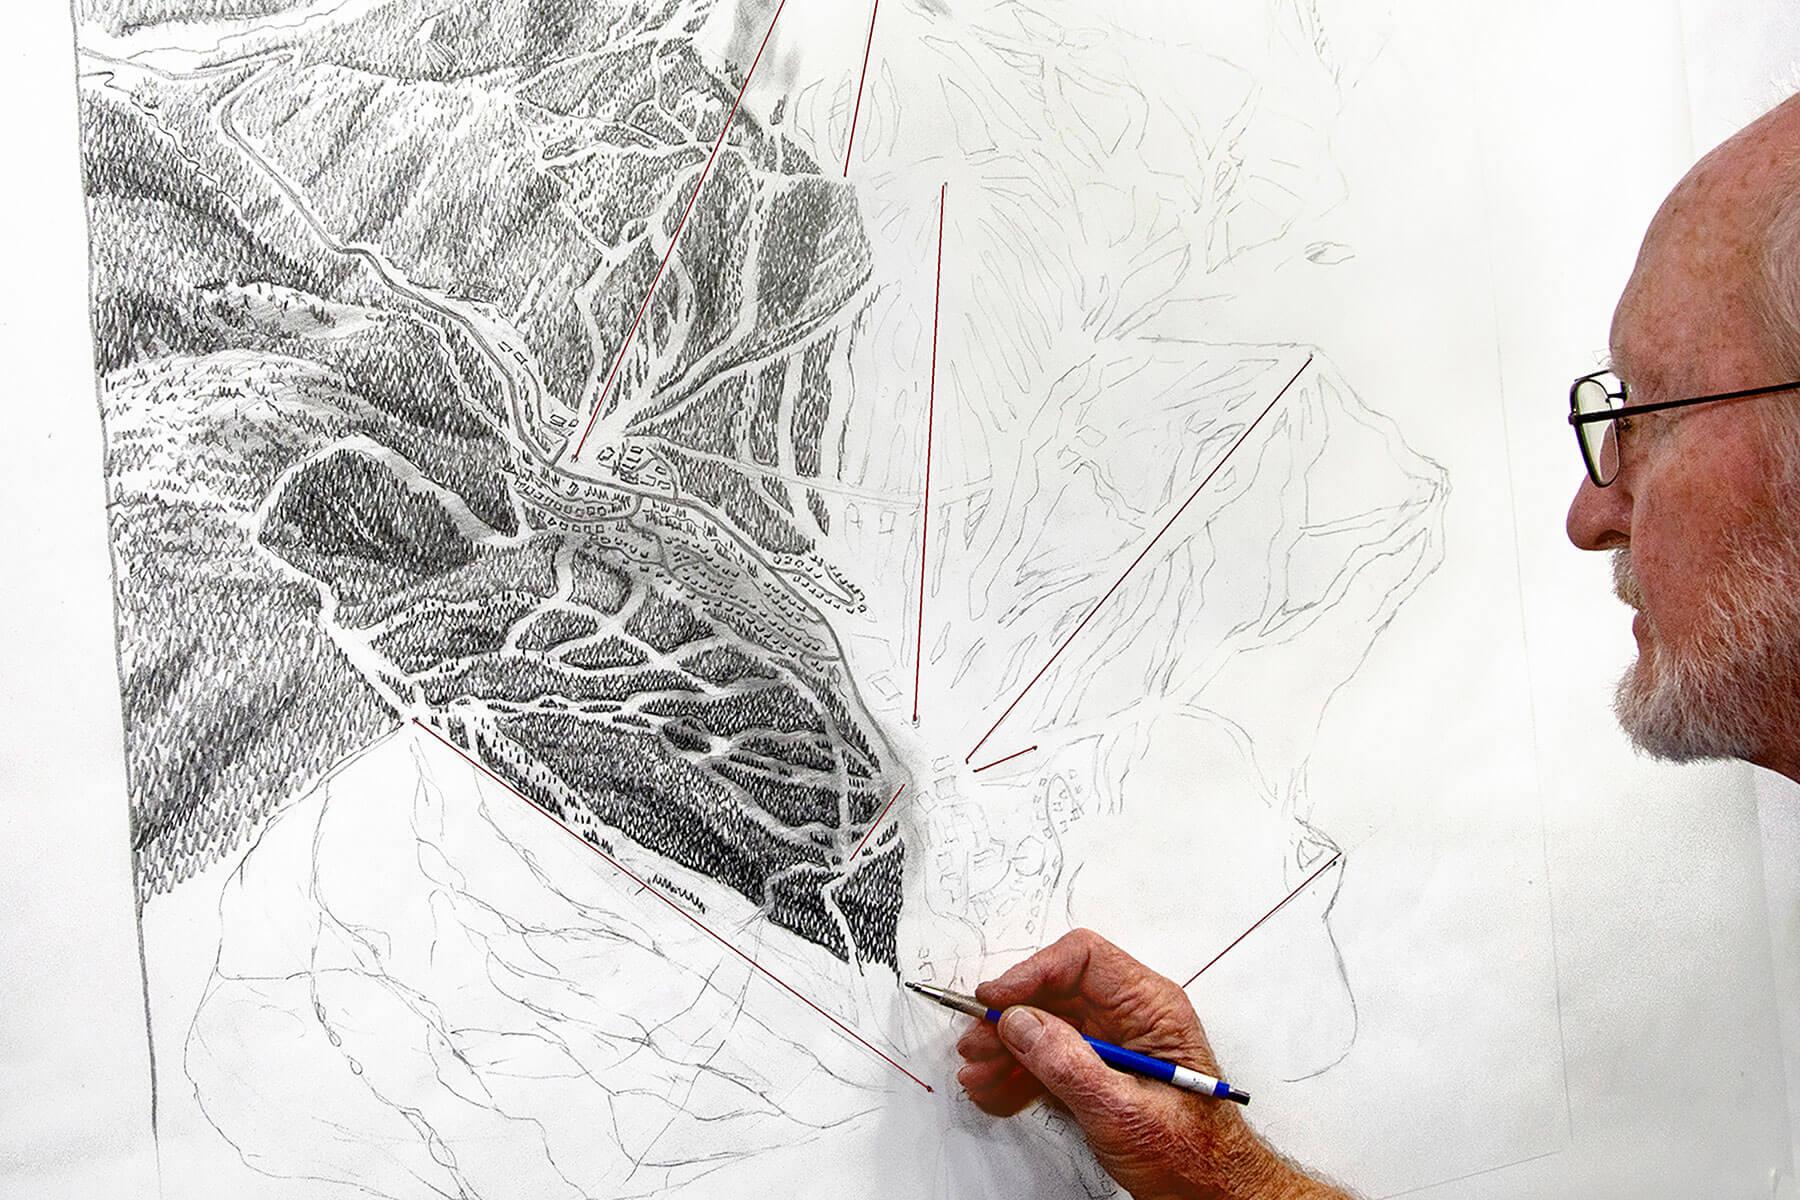 sun peaks resort, canada, trail map, James Niehues,